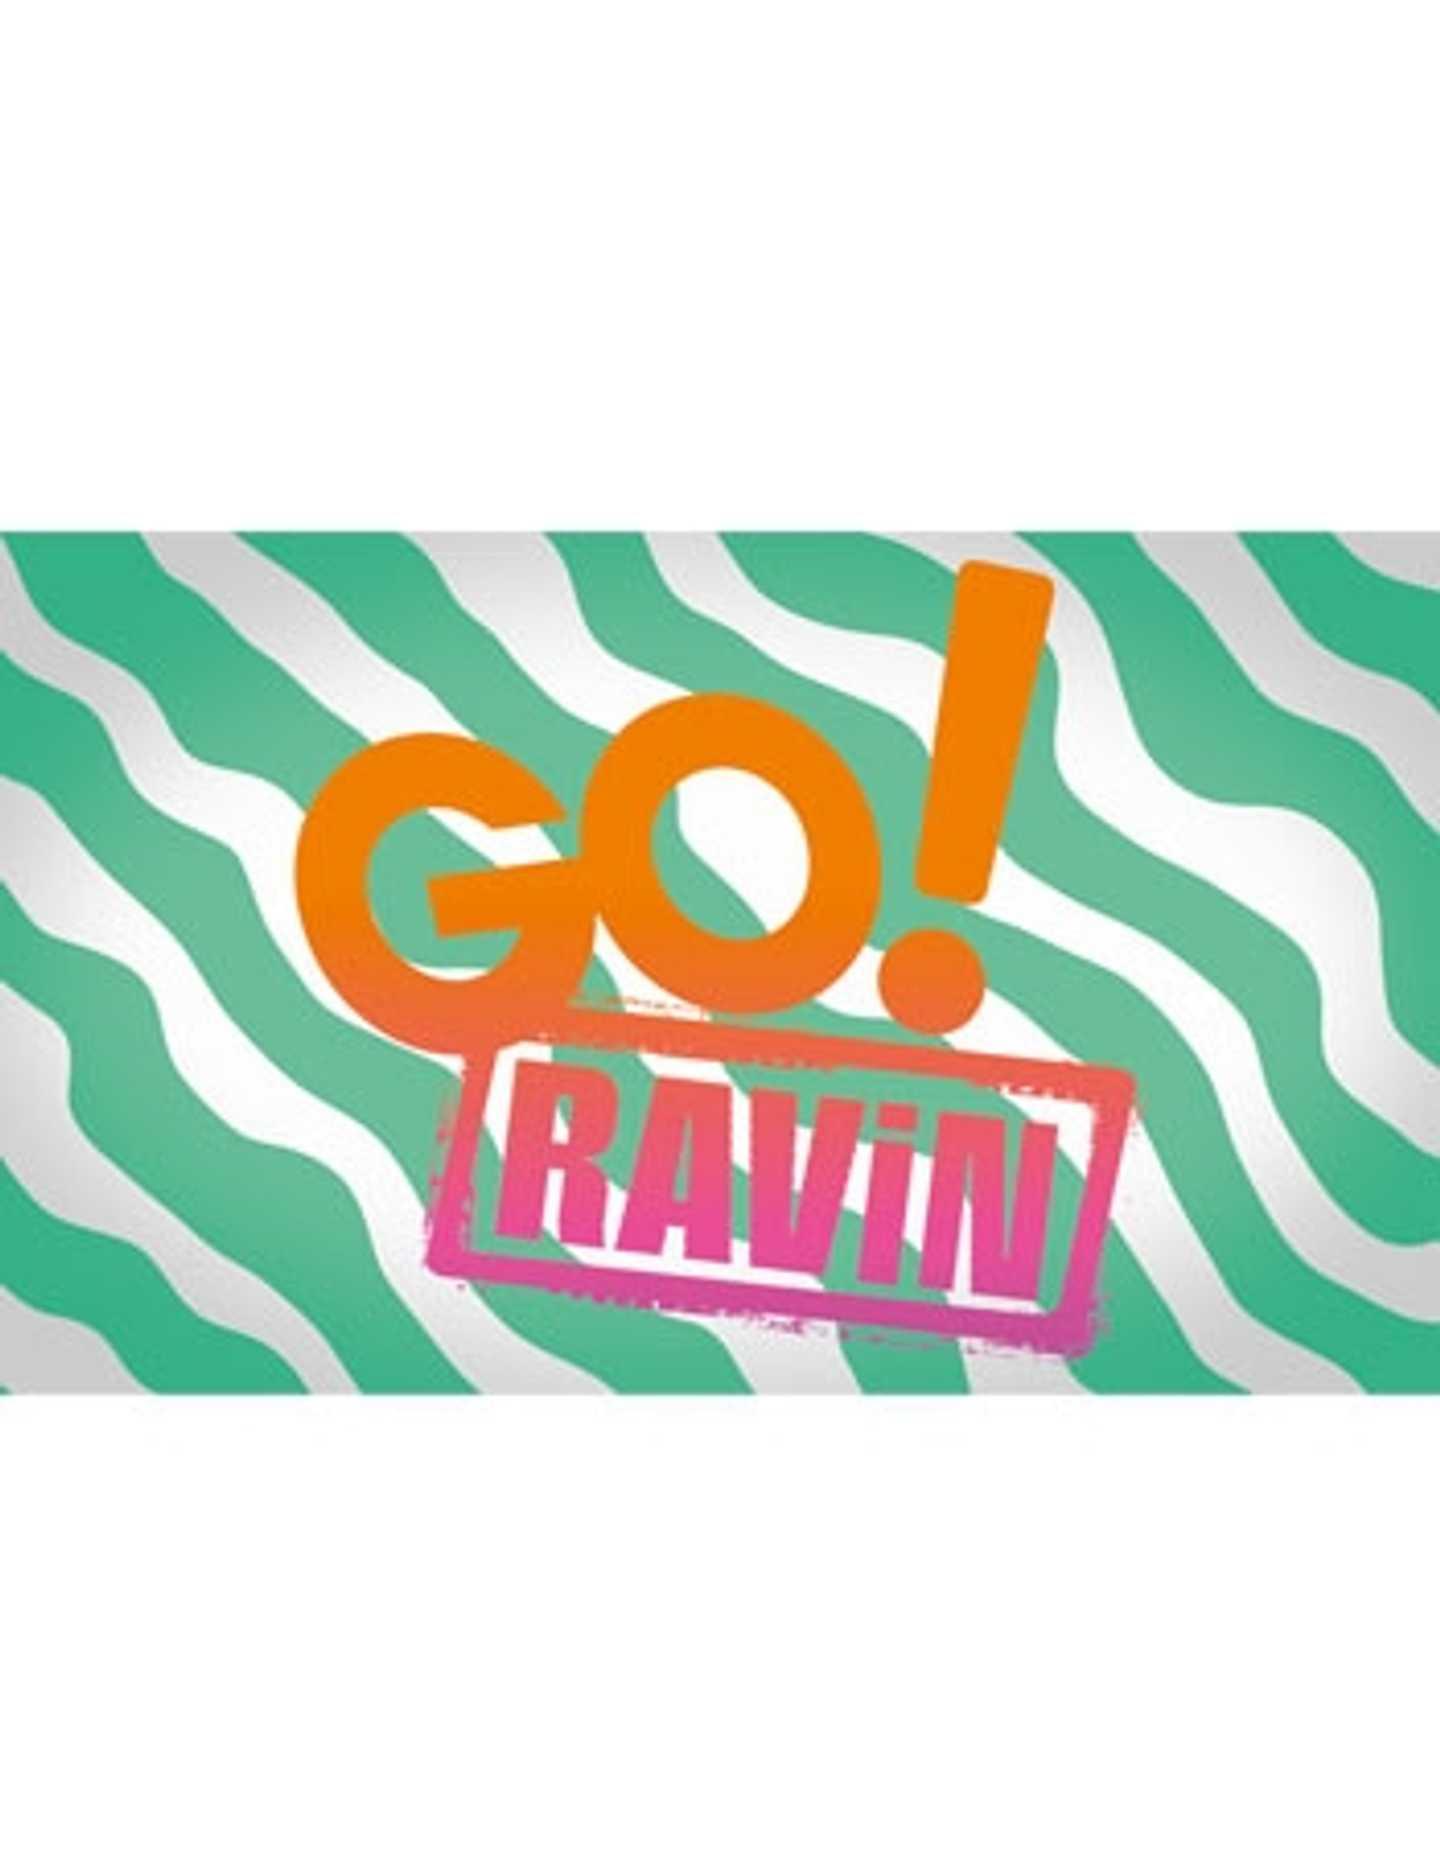 Go! Ravin